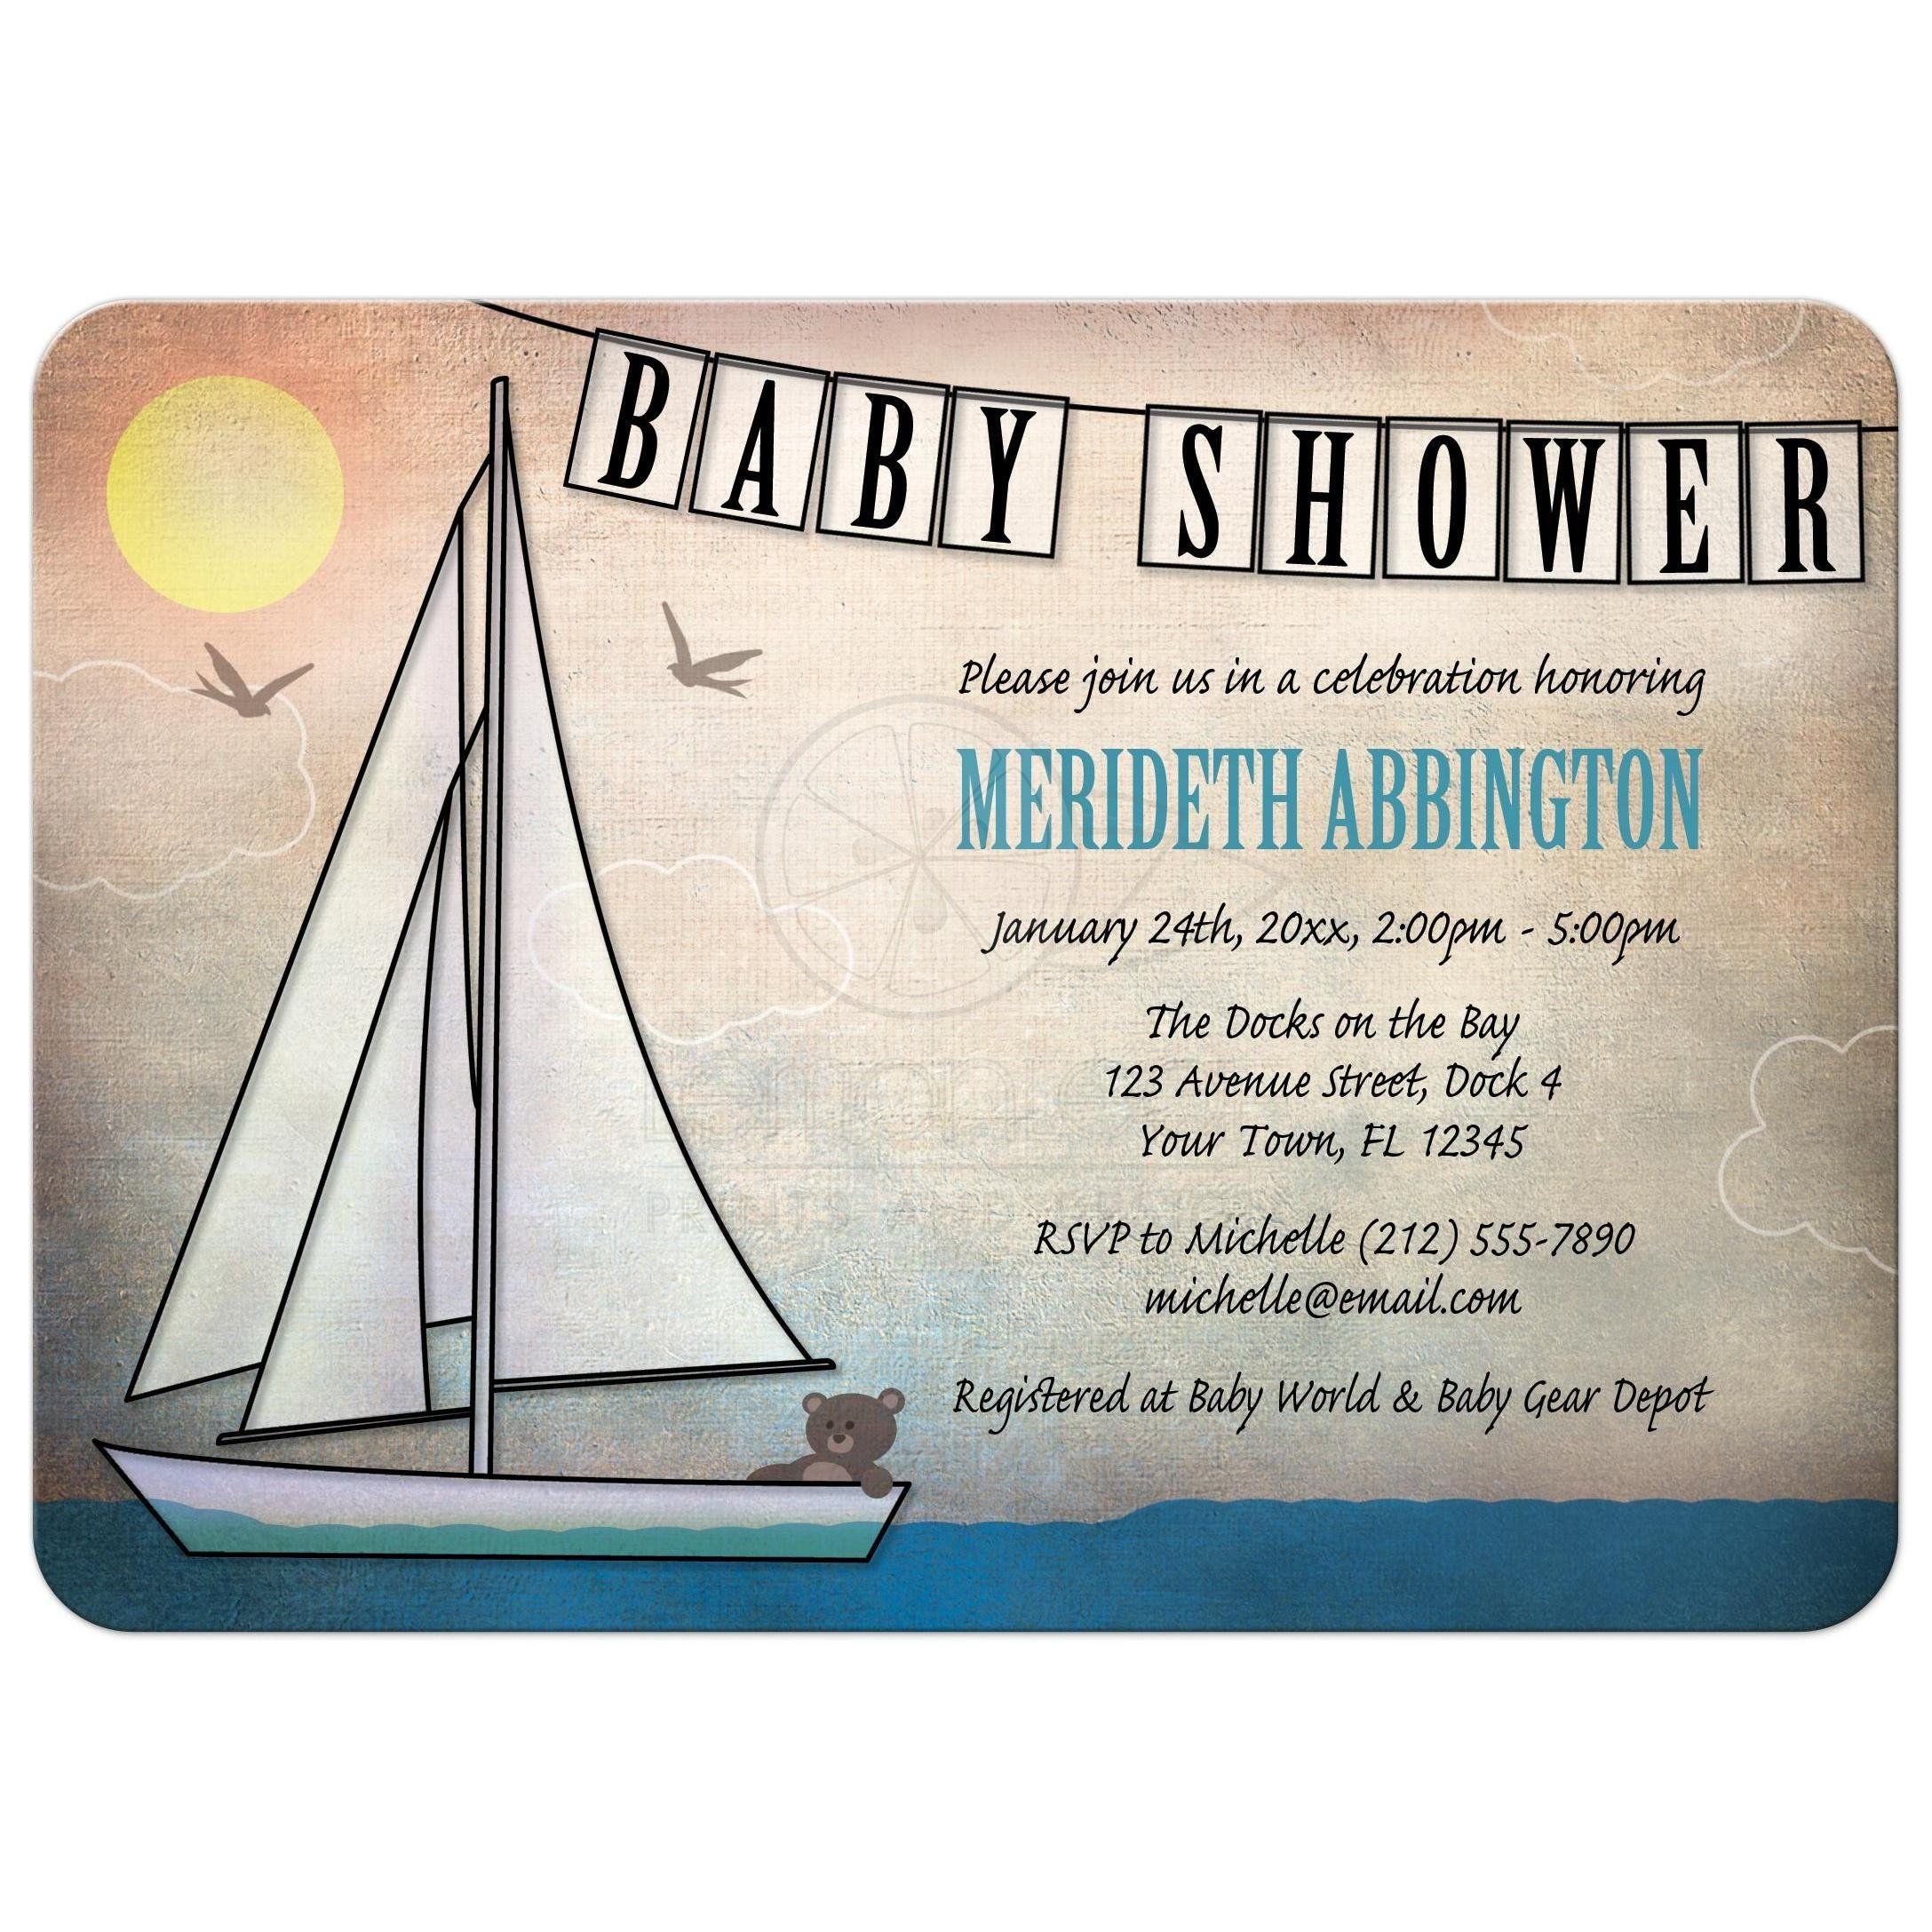 Baby Shower Invitations - Rustic Nautical Teddy Bear Sailboat ...